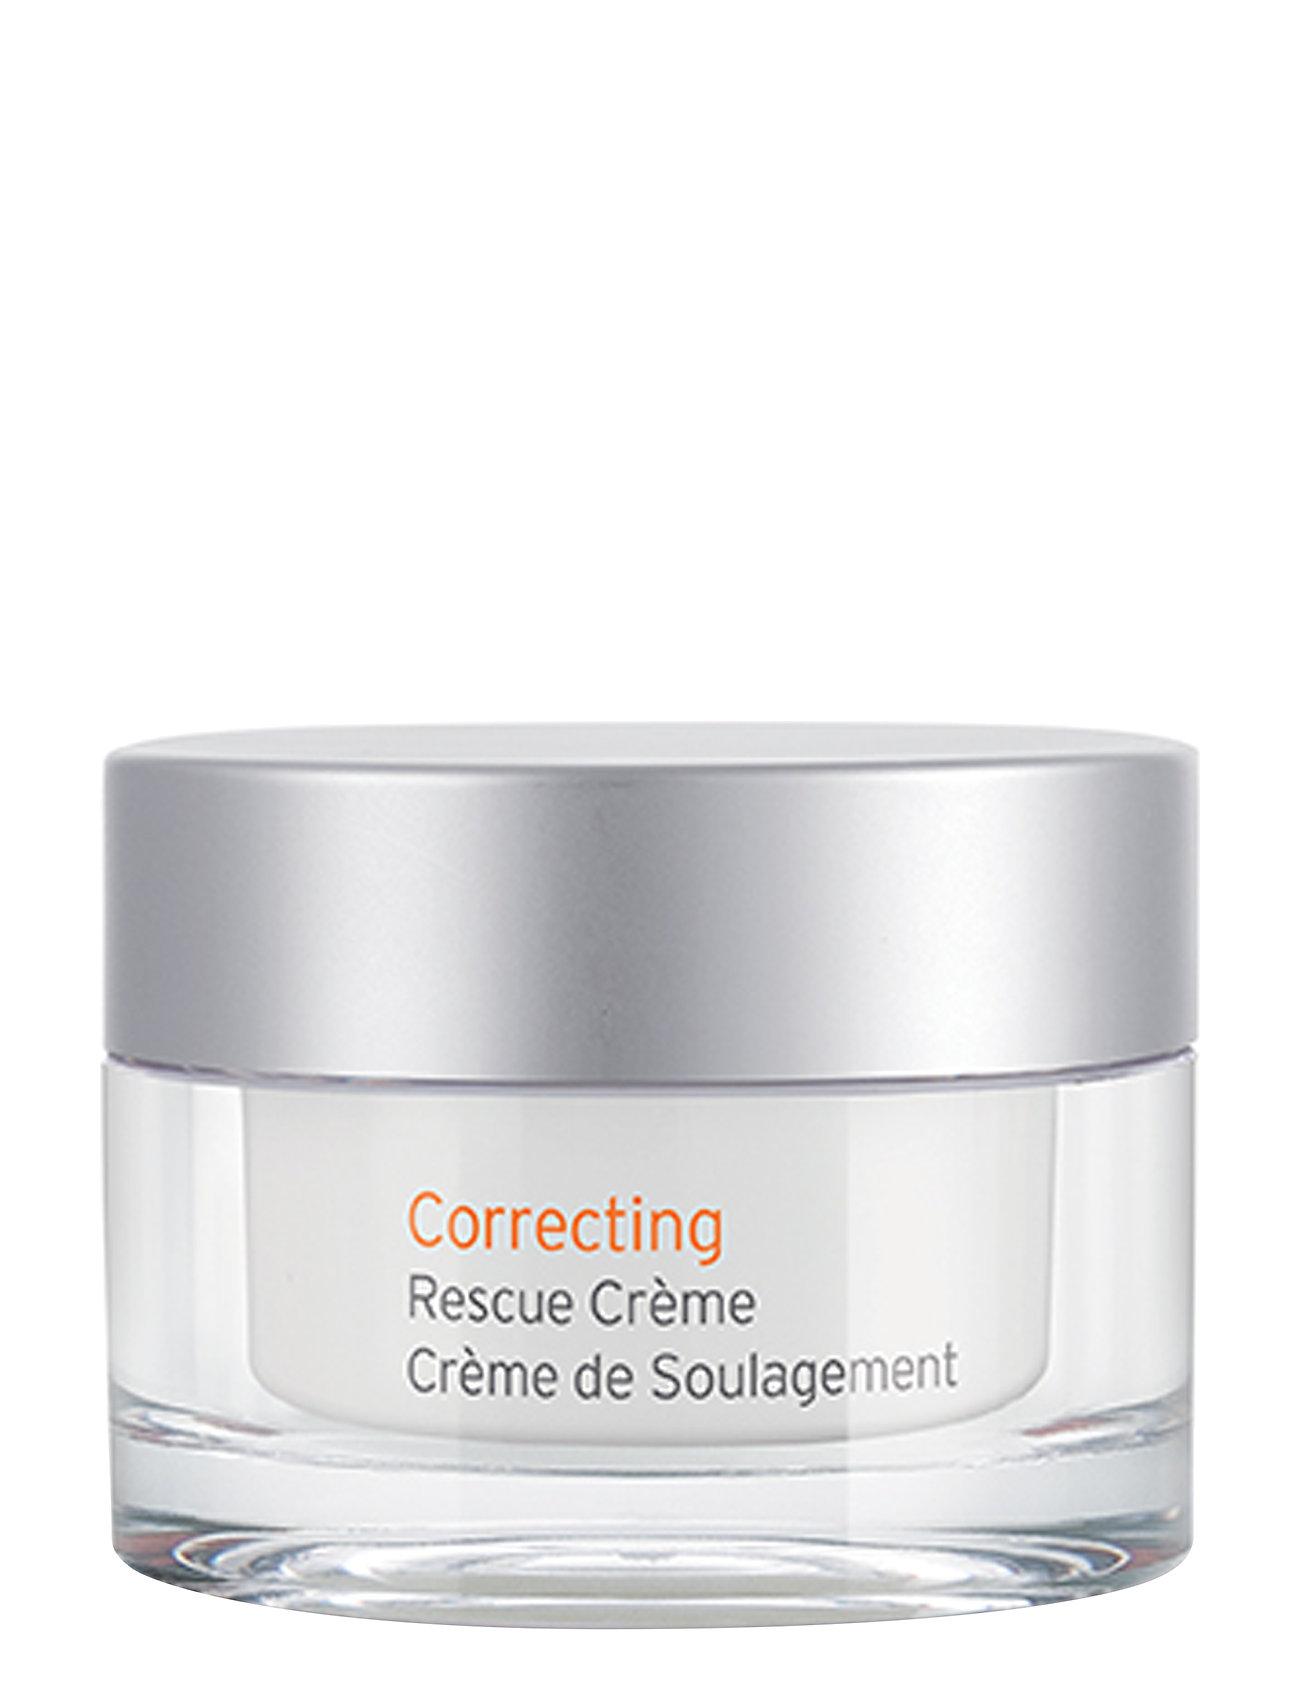 Image of Correcting Rescue Cream Beauty WOMEN Skin Care Face Day Creams Nude Kerstin Florian (3297685145)